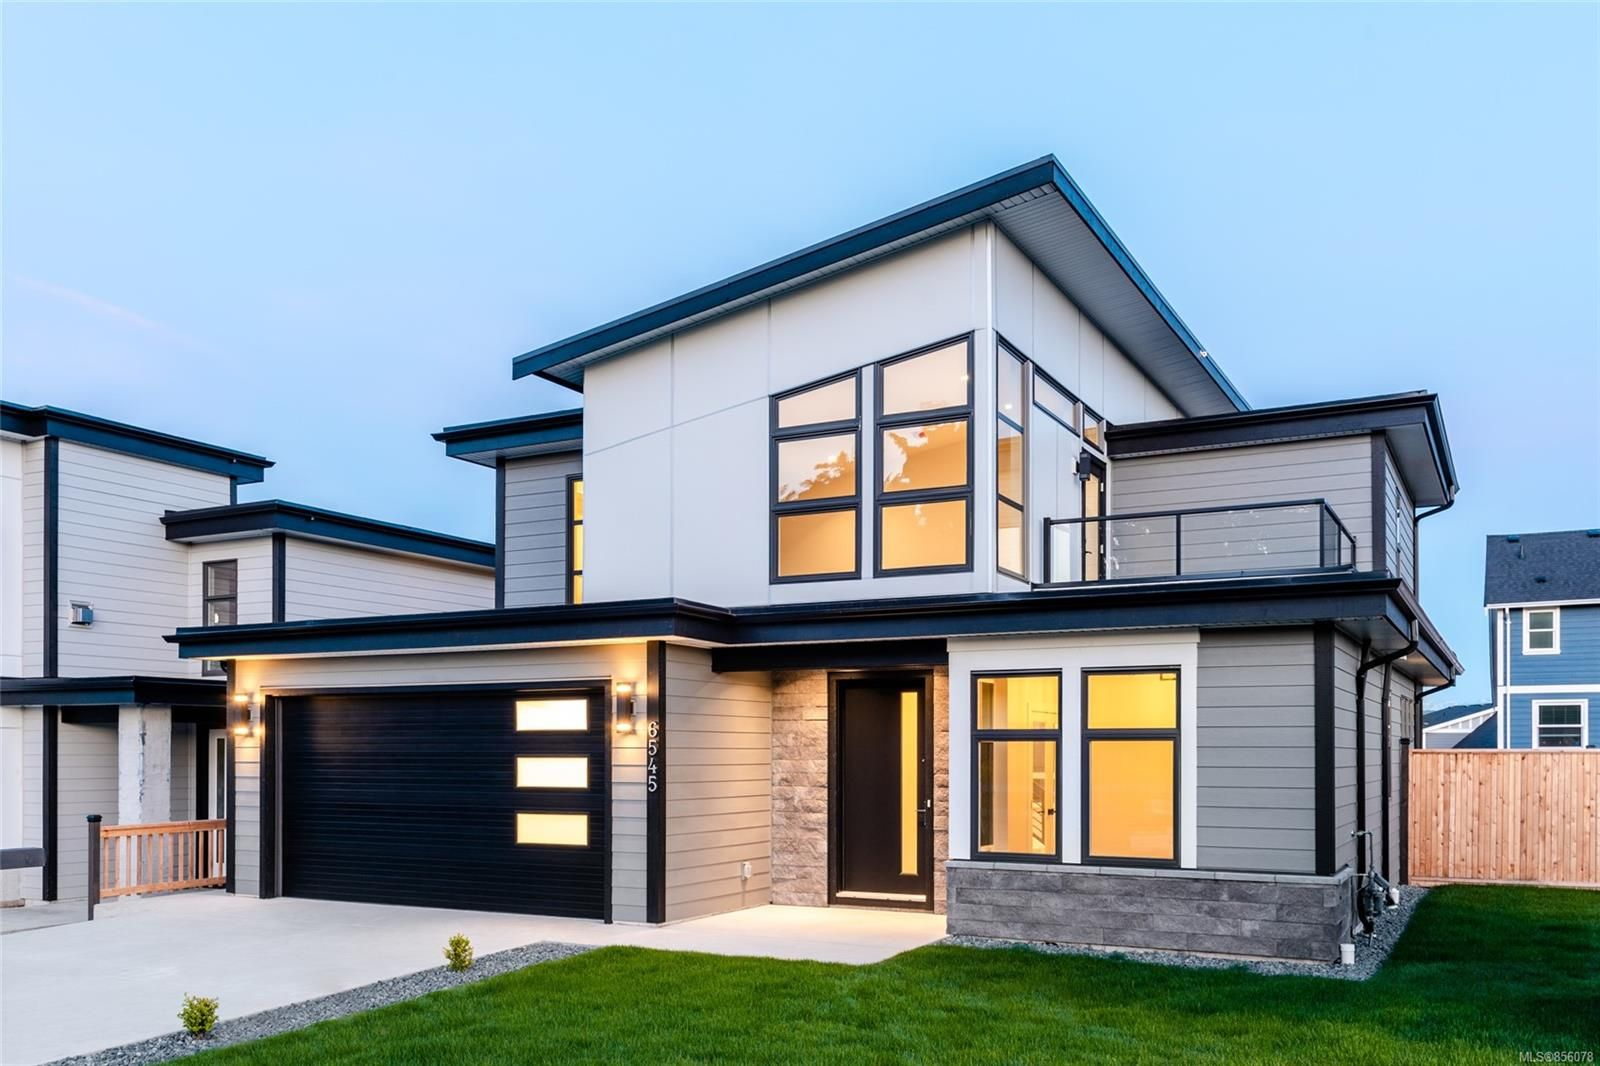 Main Photo: 6525 Helgesen Rd in : Sk Broomhill House for sale (Sooke)  : MLS®# 856078